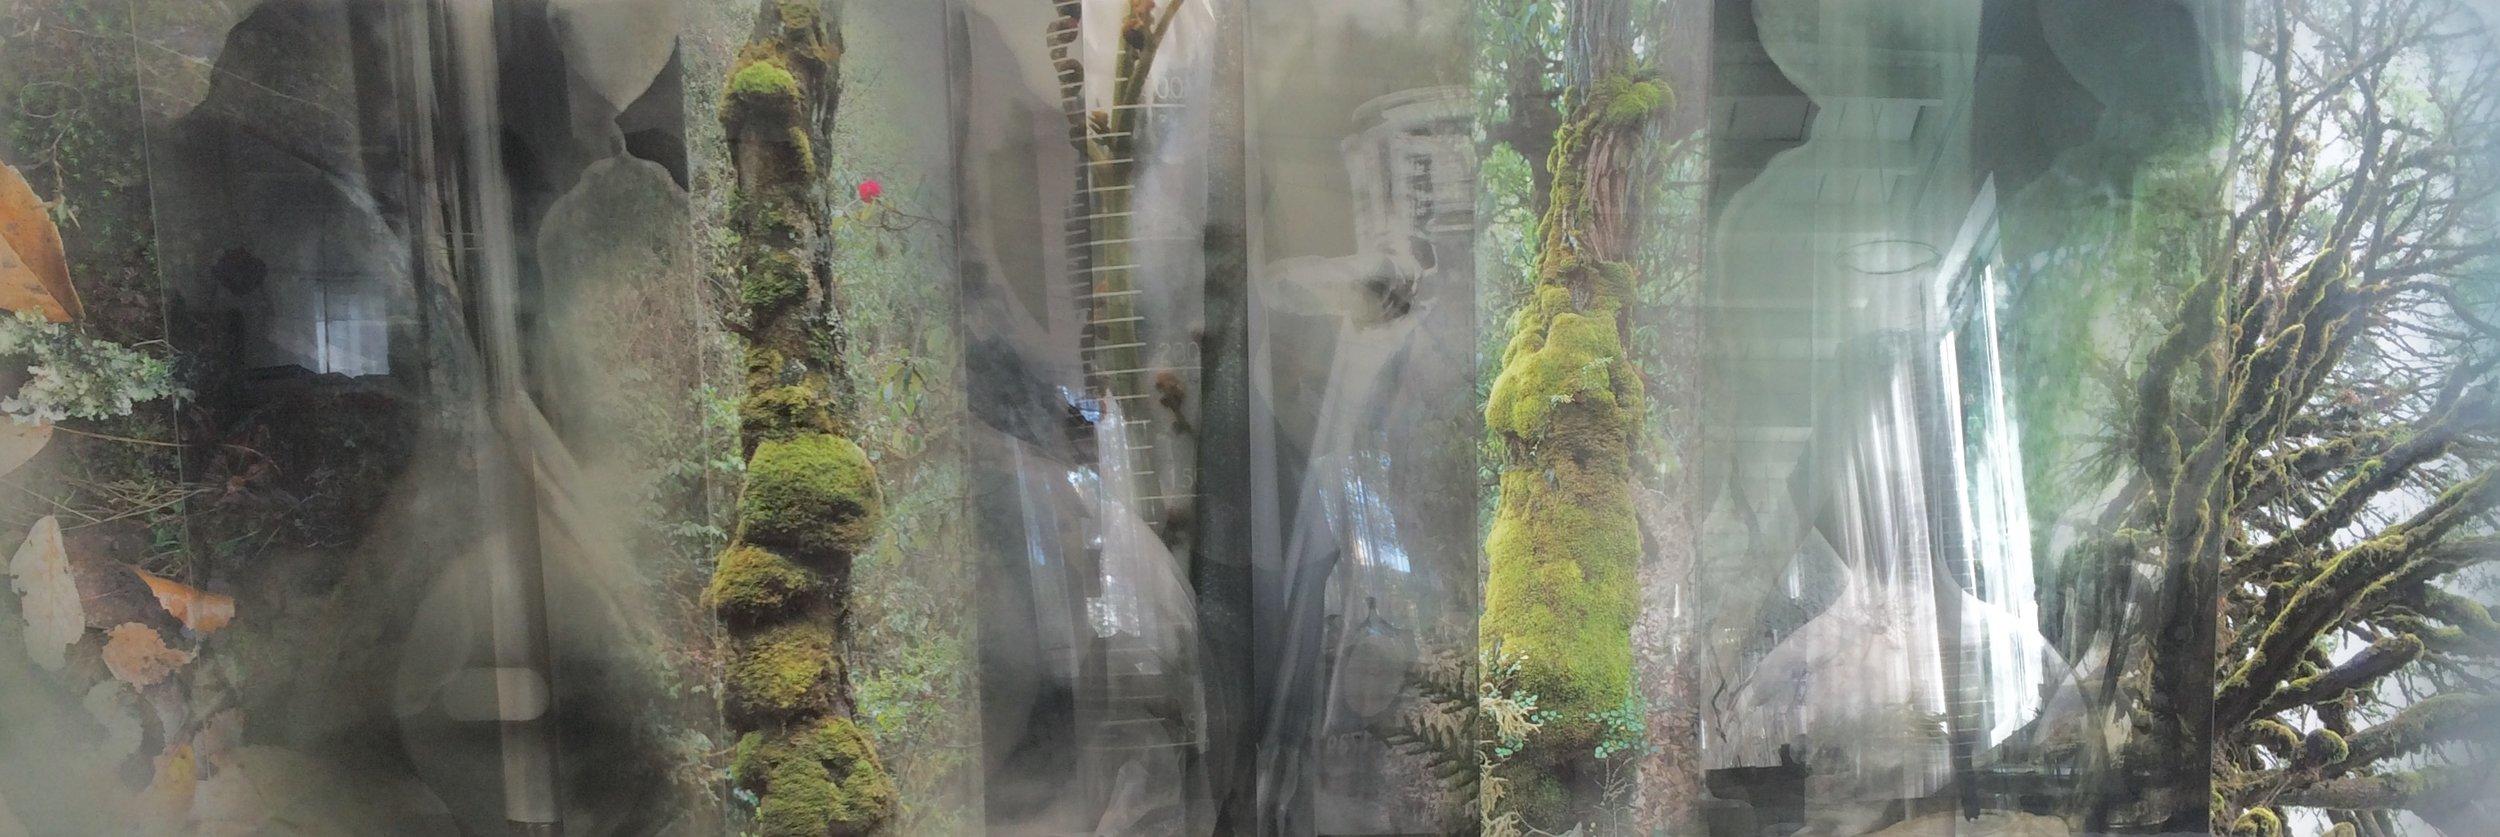 JANET LAURENCE   Chlorophyll Collapse - Collecting  2017 Dye-Sublimation prints on aluminium, Duraclear on Shinkolite Acrylic  100 x 306.5 cm